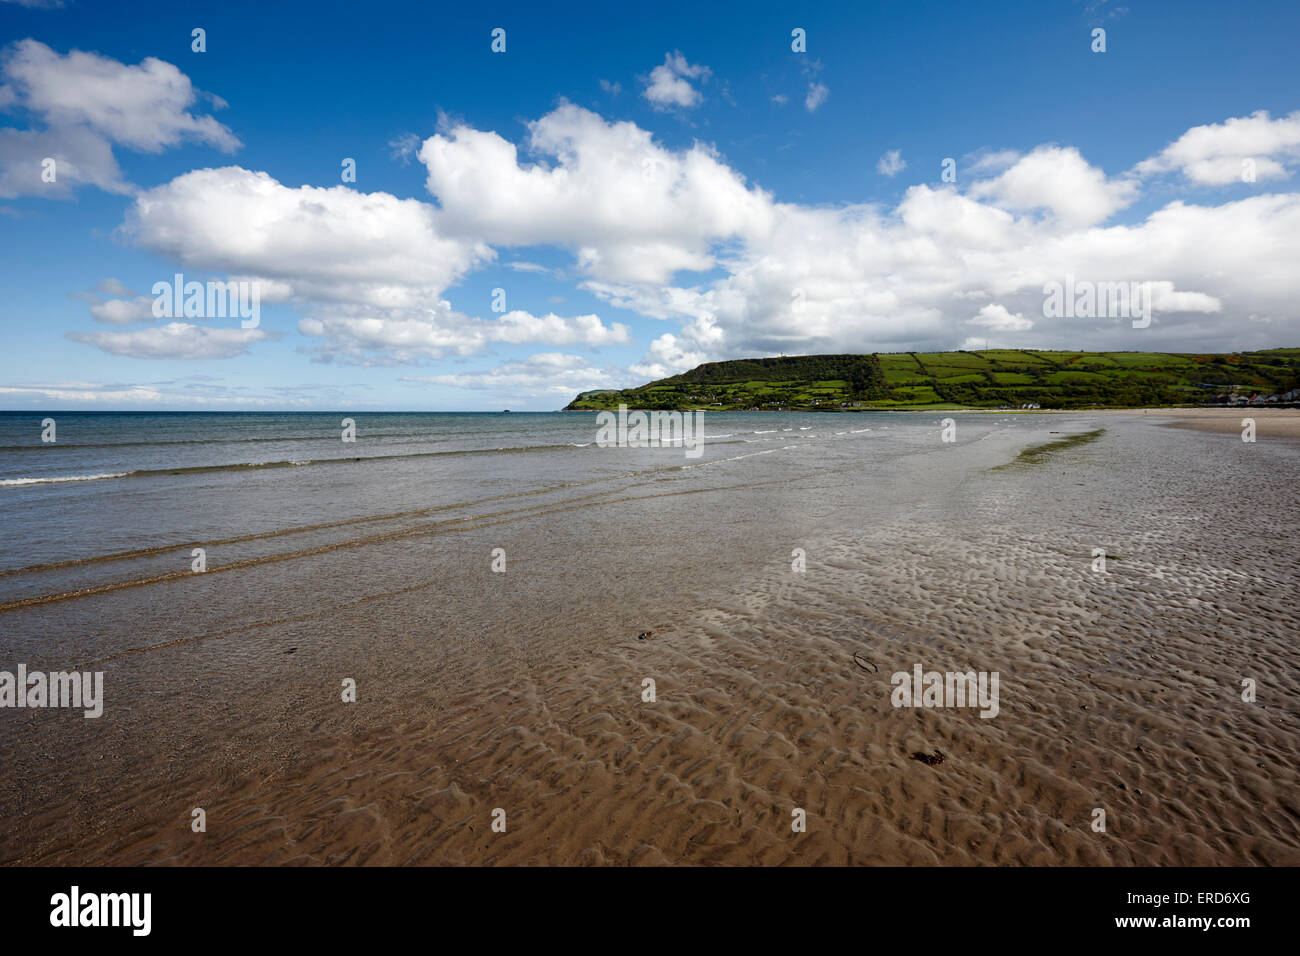 Carnlough beach County Antrim Northern Ireland UK - Stock Image